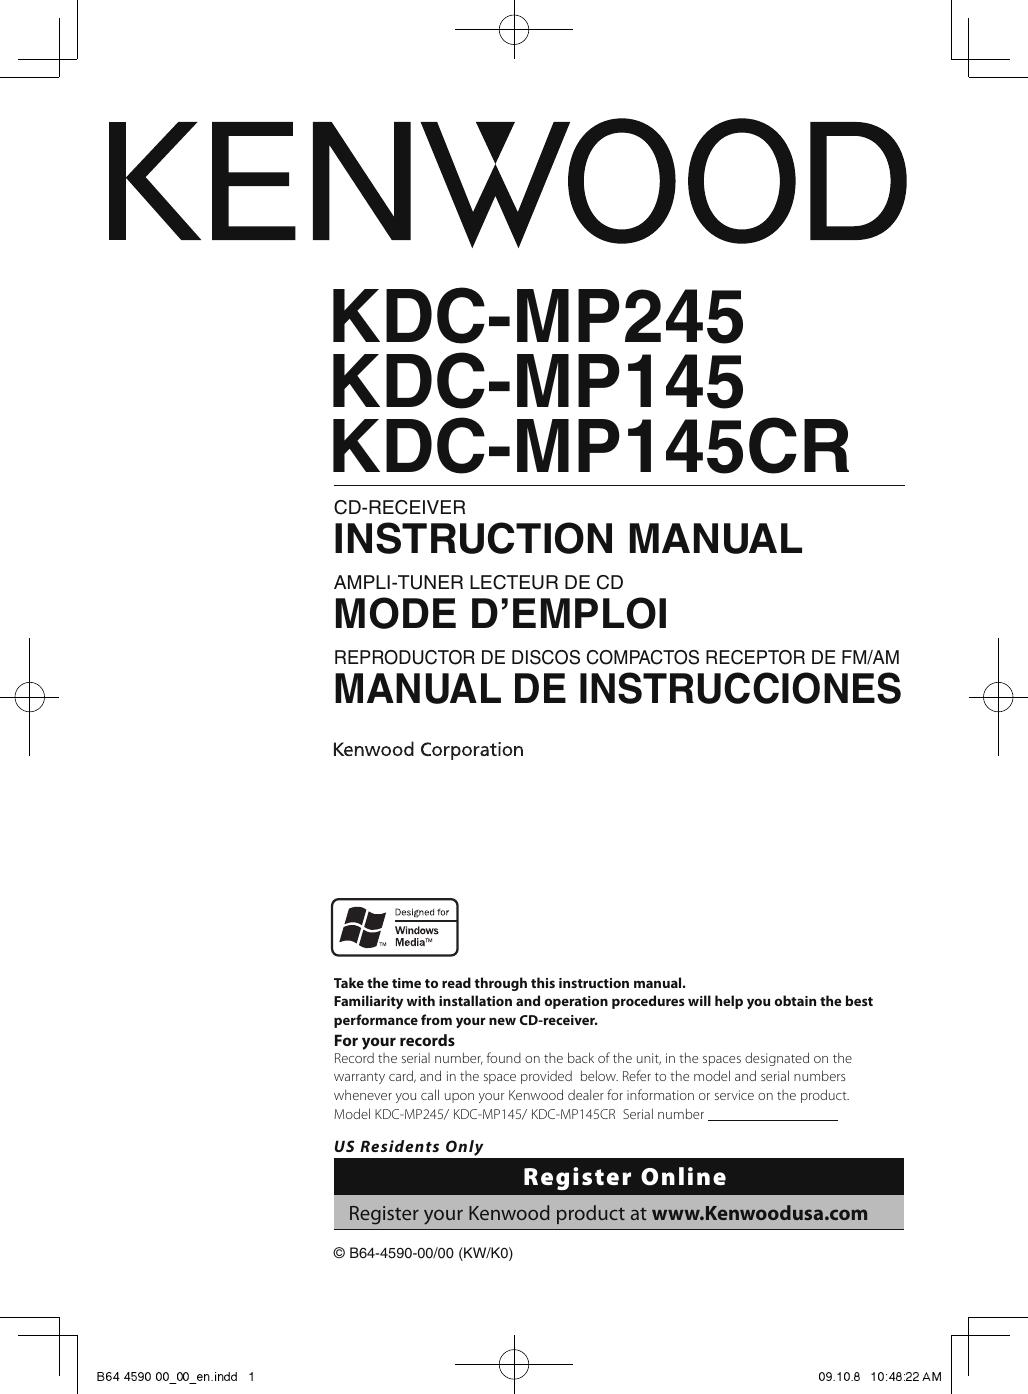 [DIAGRAM_4PO]  Kenwood Kdc Mp245 Users Manual B64 4590 00_00_en | Kenwood Kdc Mp245 Wiring Diagram |  | UserManual.wiki